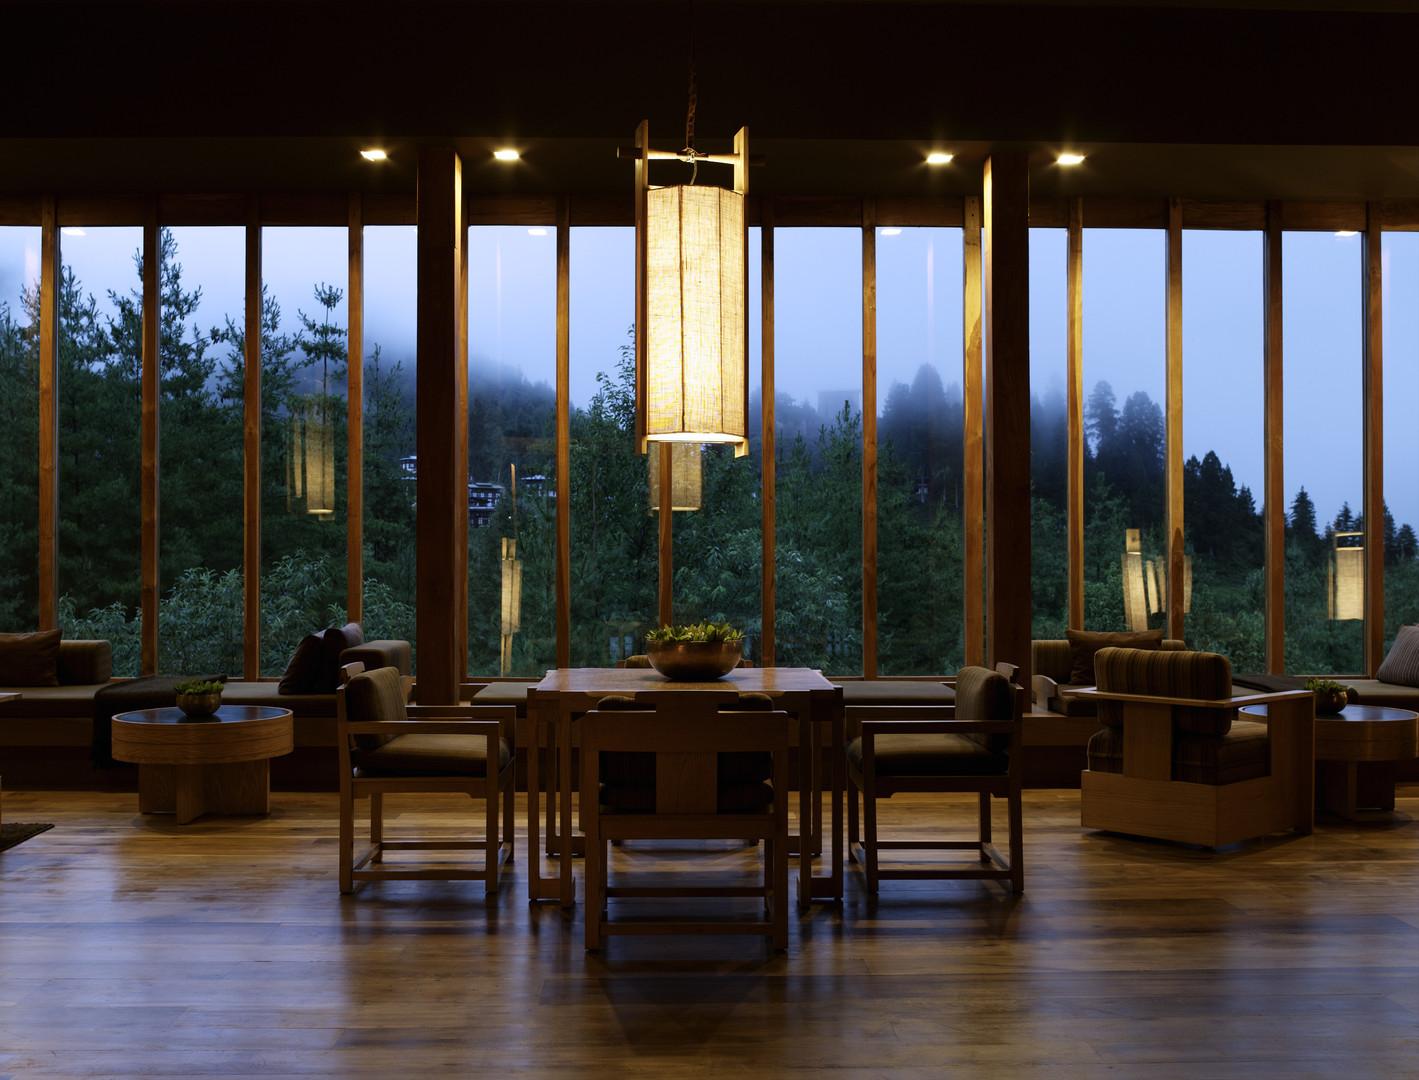 One of experiential tour hotels in Paro, Bhutan. Amankora- Paro.